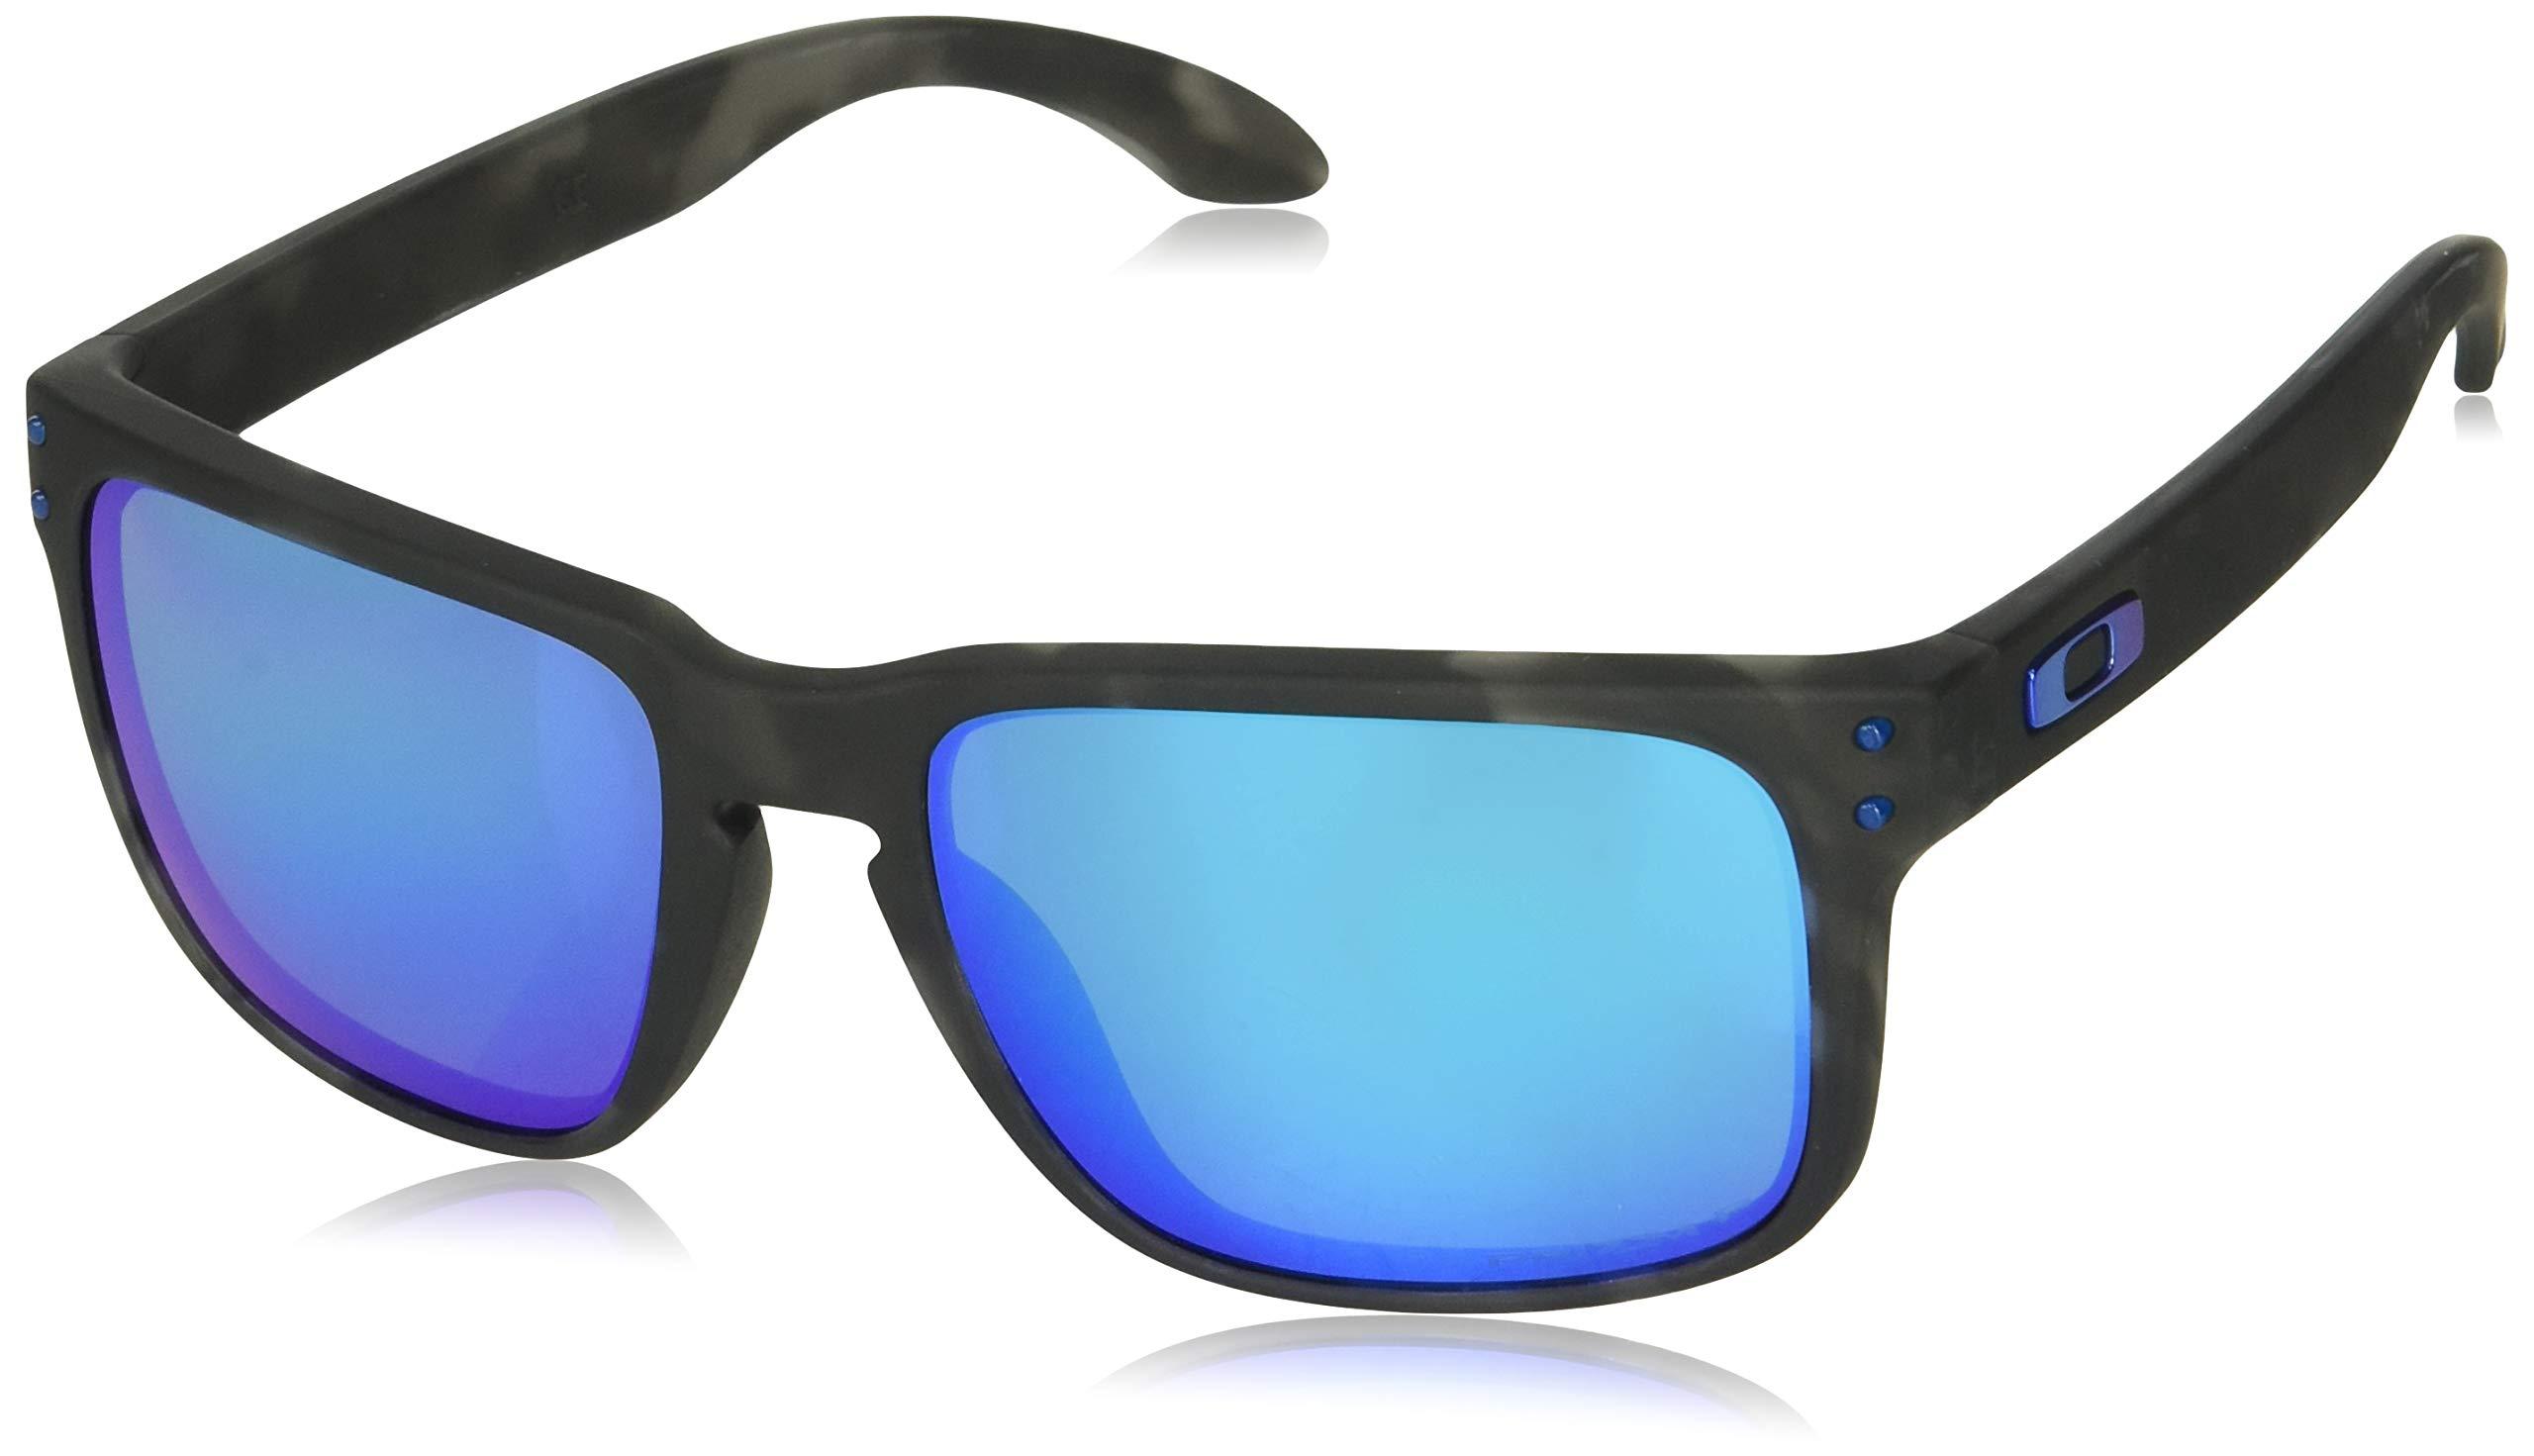 Oakley Men's Holbrook Polarized Iridium Square Sunglasses MATTE BLACK TORTOISE 57.0 mm